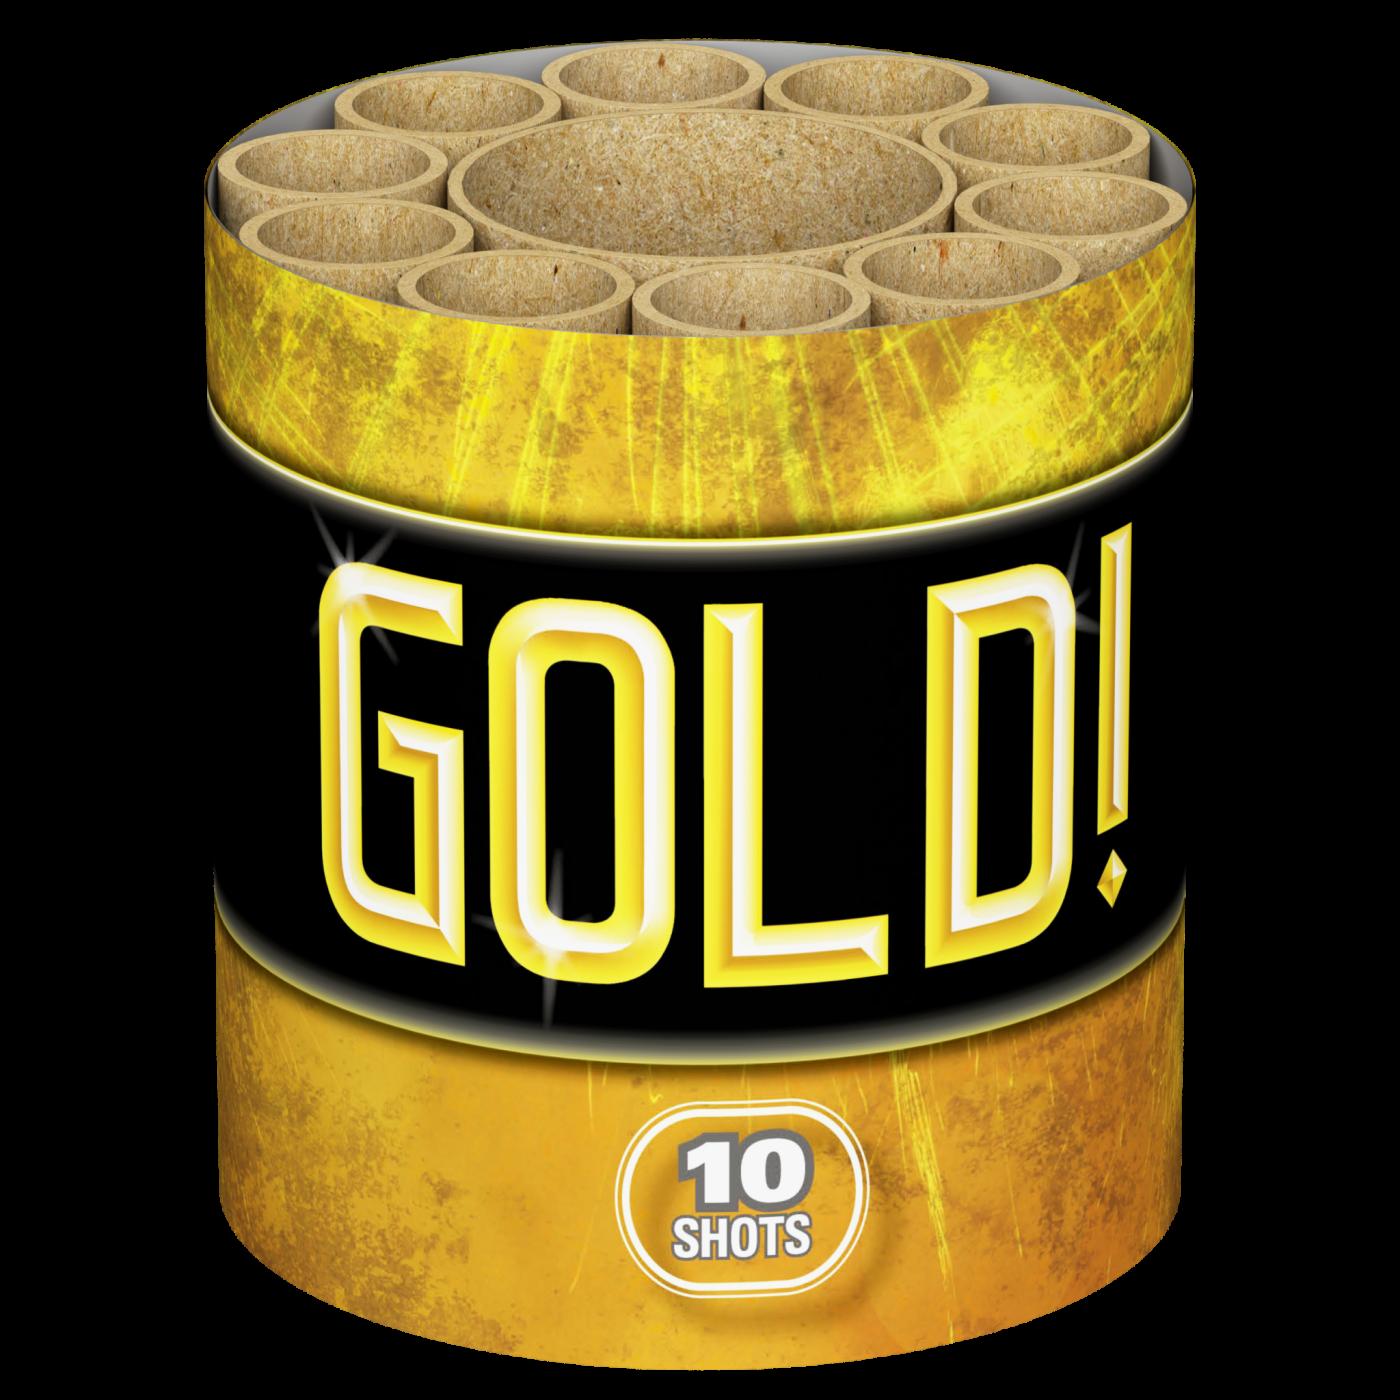 Gold, 10 shots